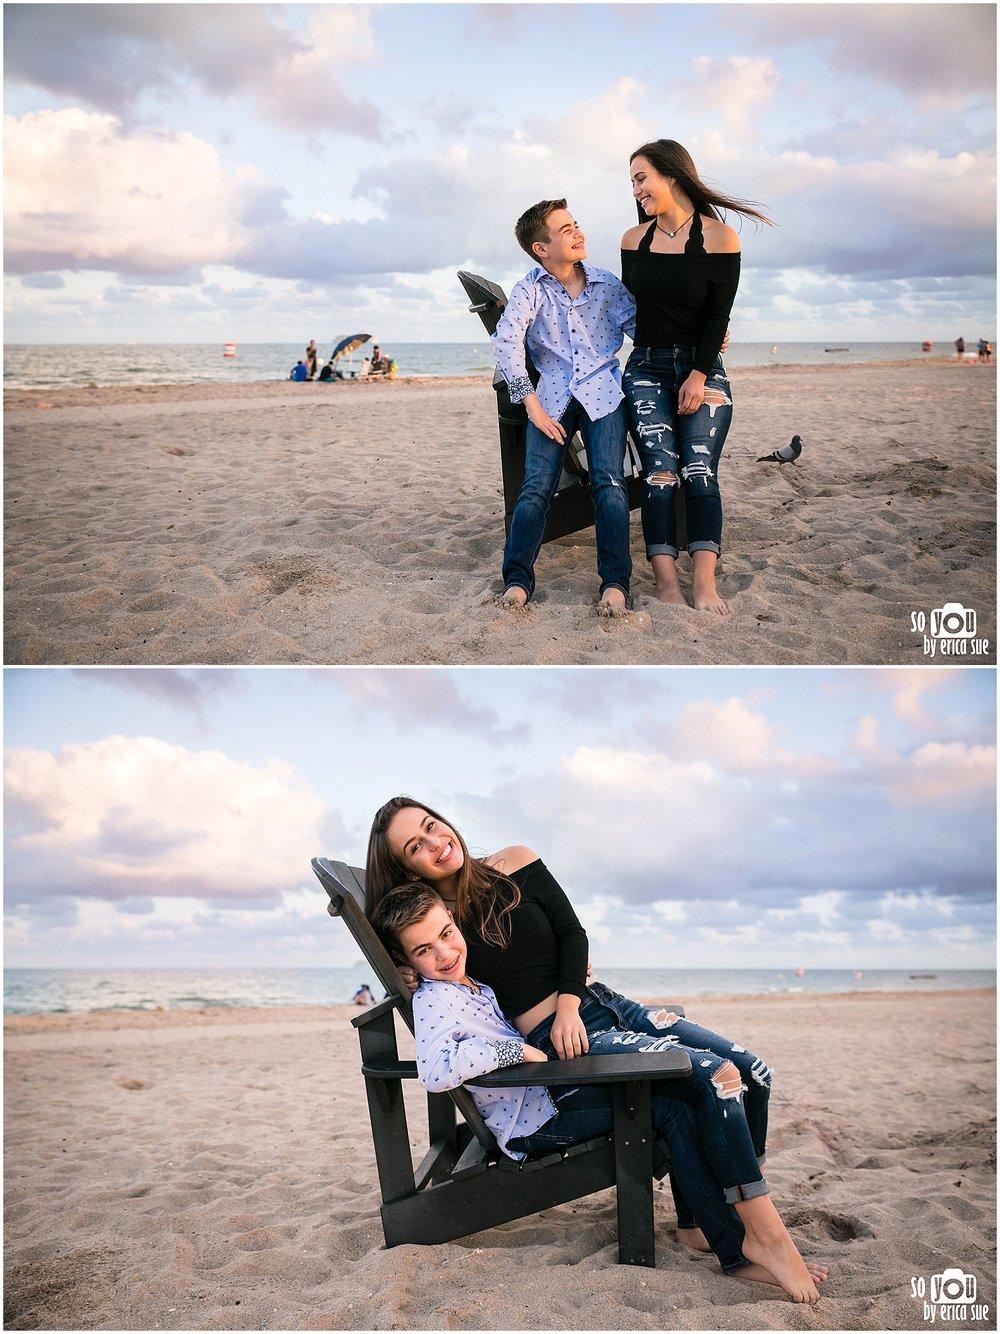 bar-mitzvay-pre-shoot-family-photography-so-you-by-erica-sue-ft-lauderdale-fl-florida-beach-9169 (2).jpg